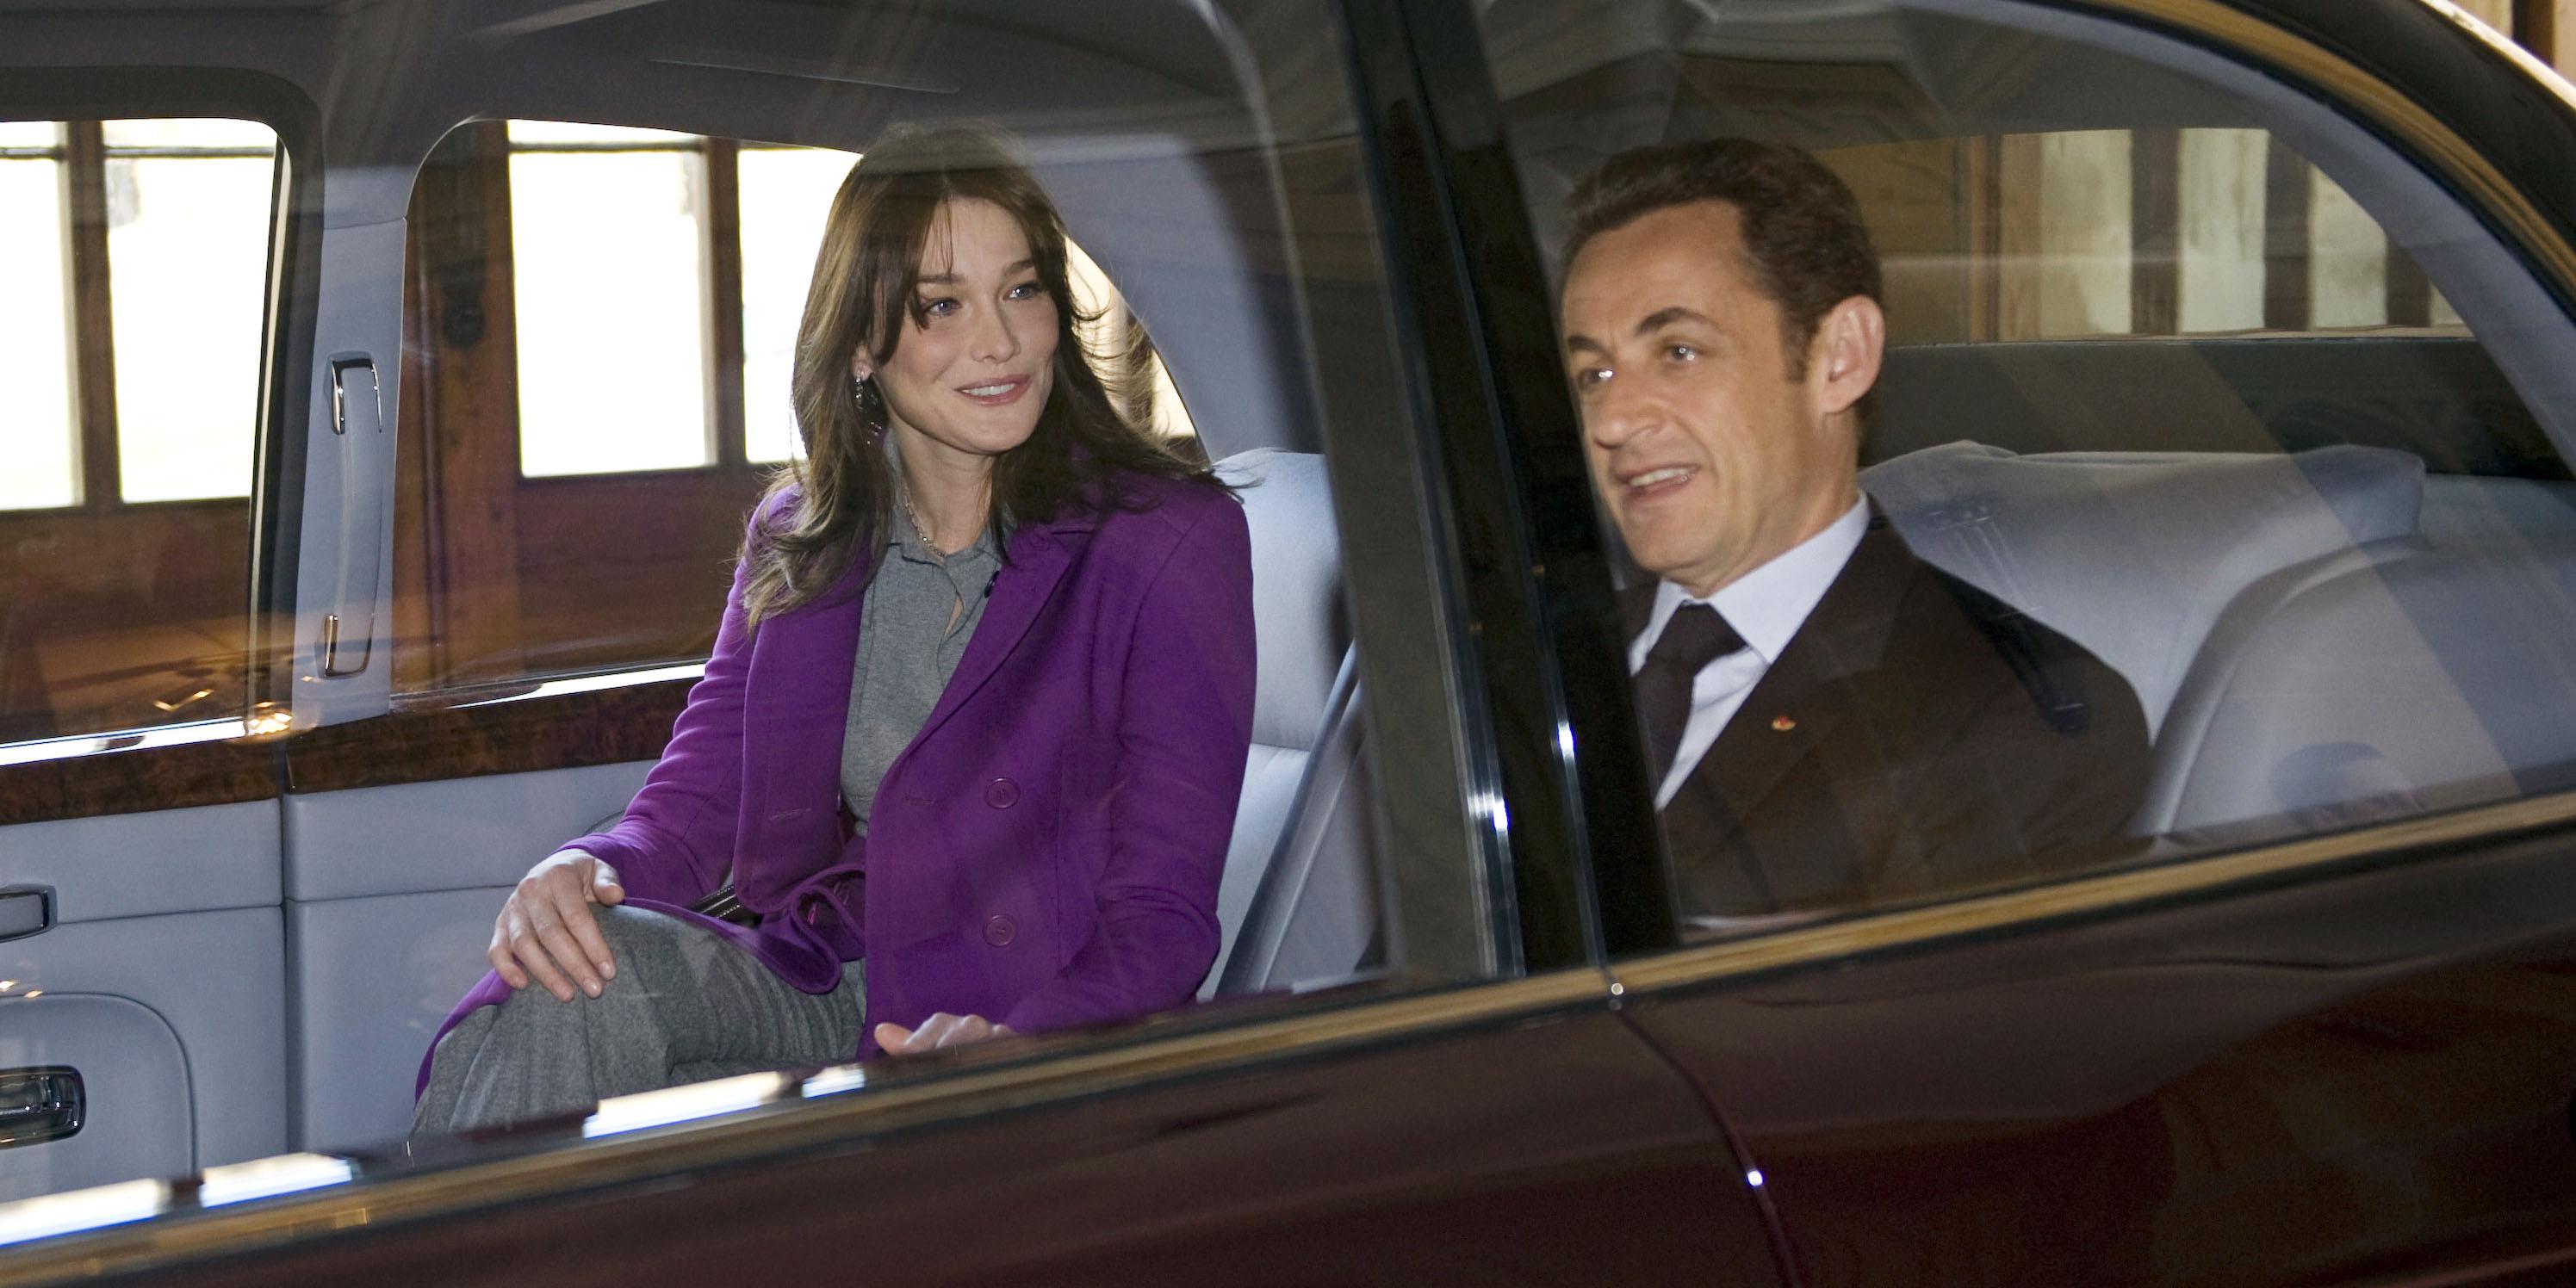 Carla Bruni And Nicolas Sarkozy At Disneyland How A Photographer Got The Scoop Teller Report